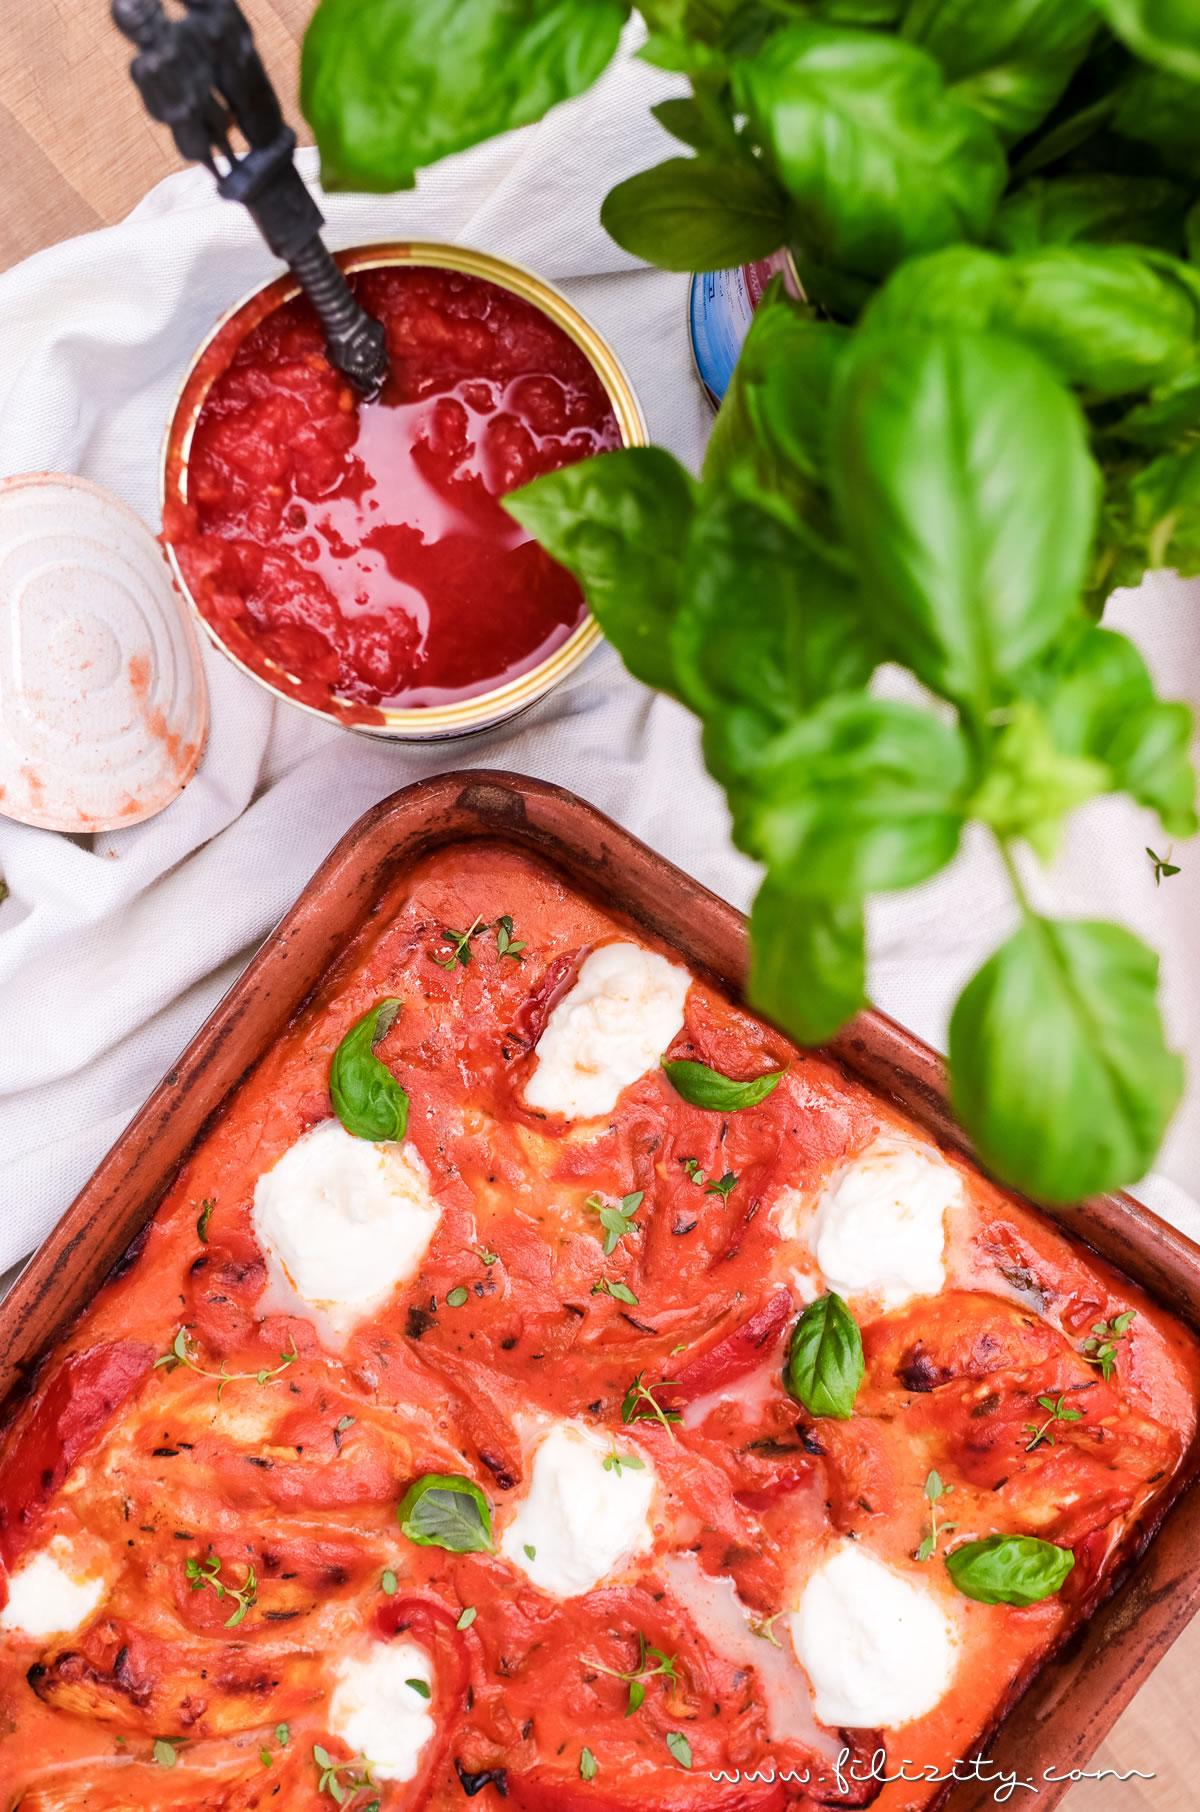 Hähnchen Toskana mit Burrata & frischen Kräutern | Angelehnt an Hackbällchen Toskana | Filizity.com | Food-Blog aus dem Rheinland #mutti #tomaten #toskana #toscana